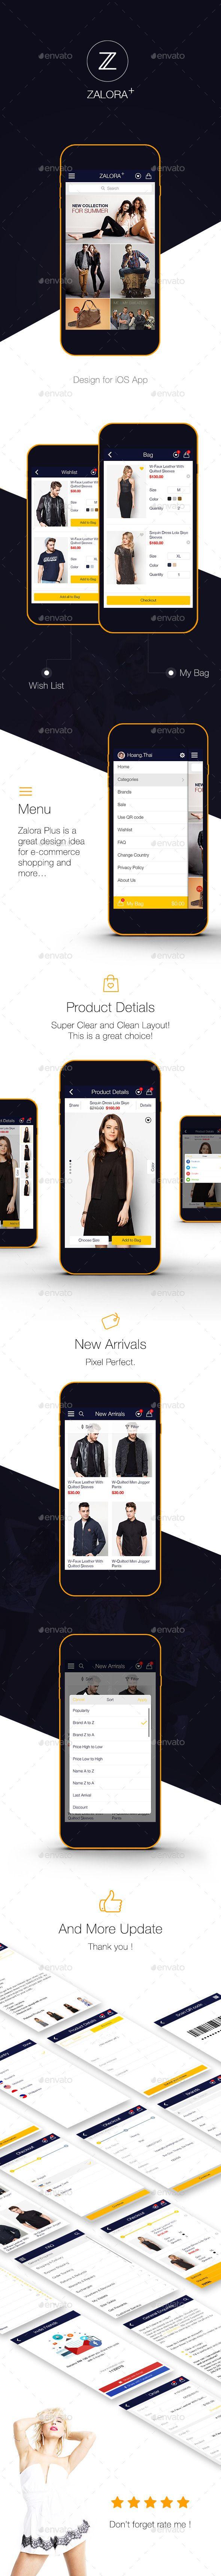 Zalora Plus Shopping UI for e-commerce UI Graphic #design Download: http://graphicriver.net/item/zalora-plus-shopping-ui-for-ecommerce-ui-graphic-/12582508?ref=ksioks